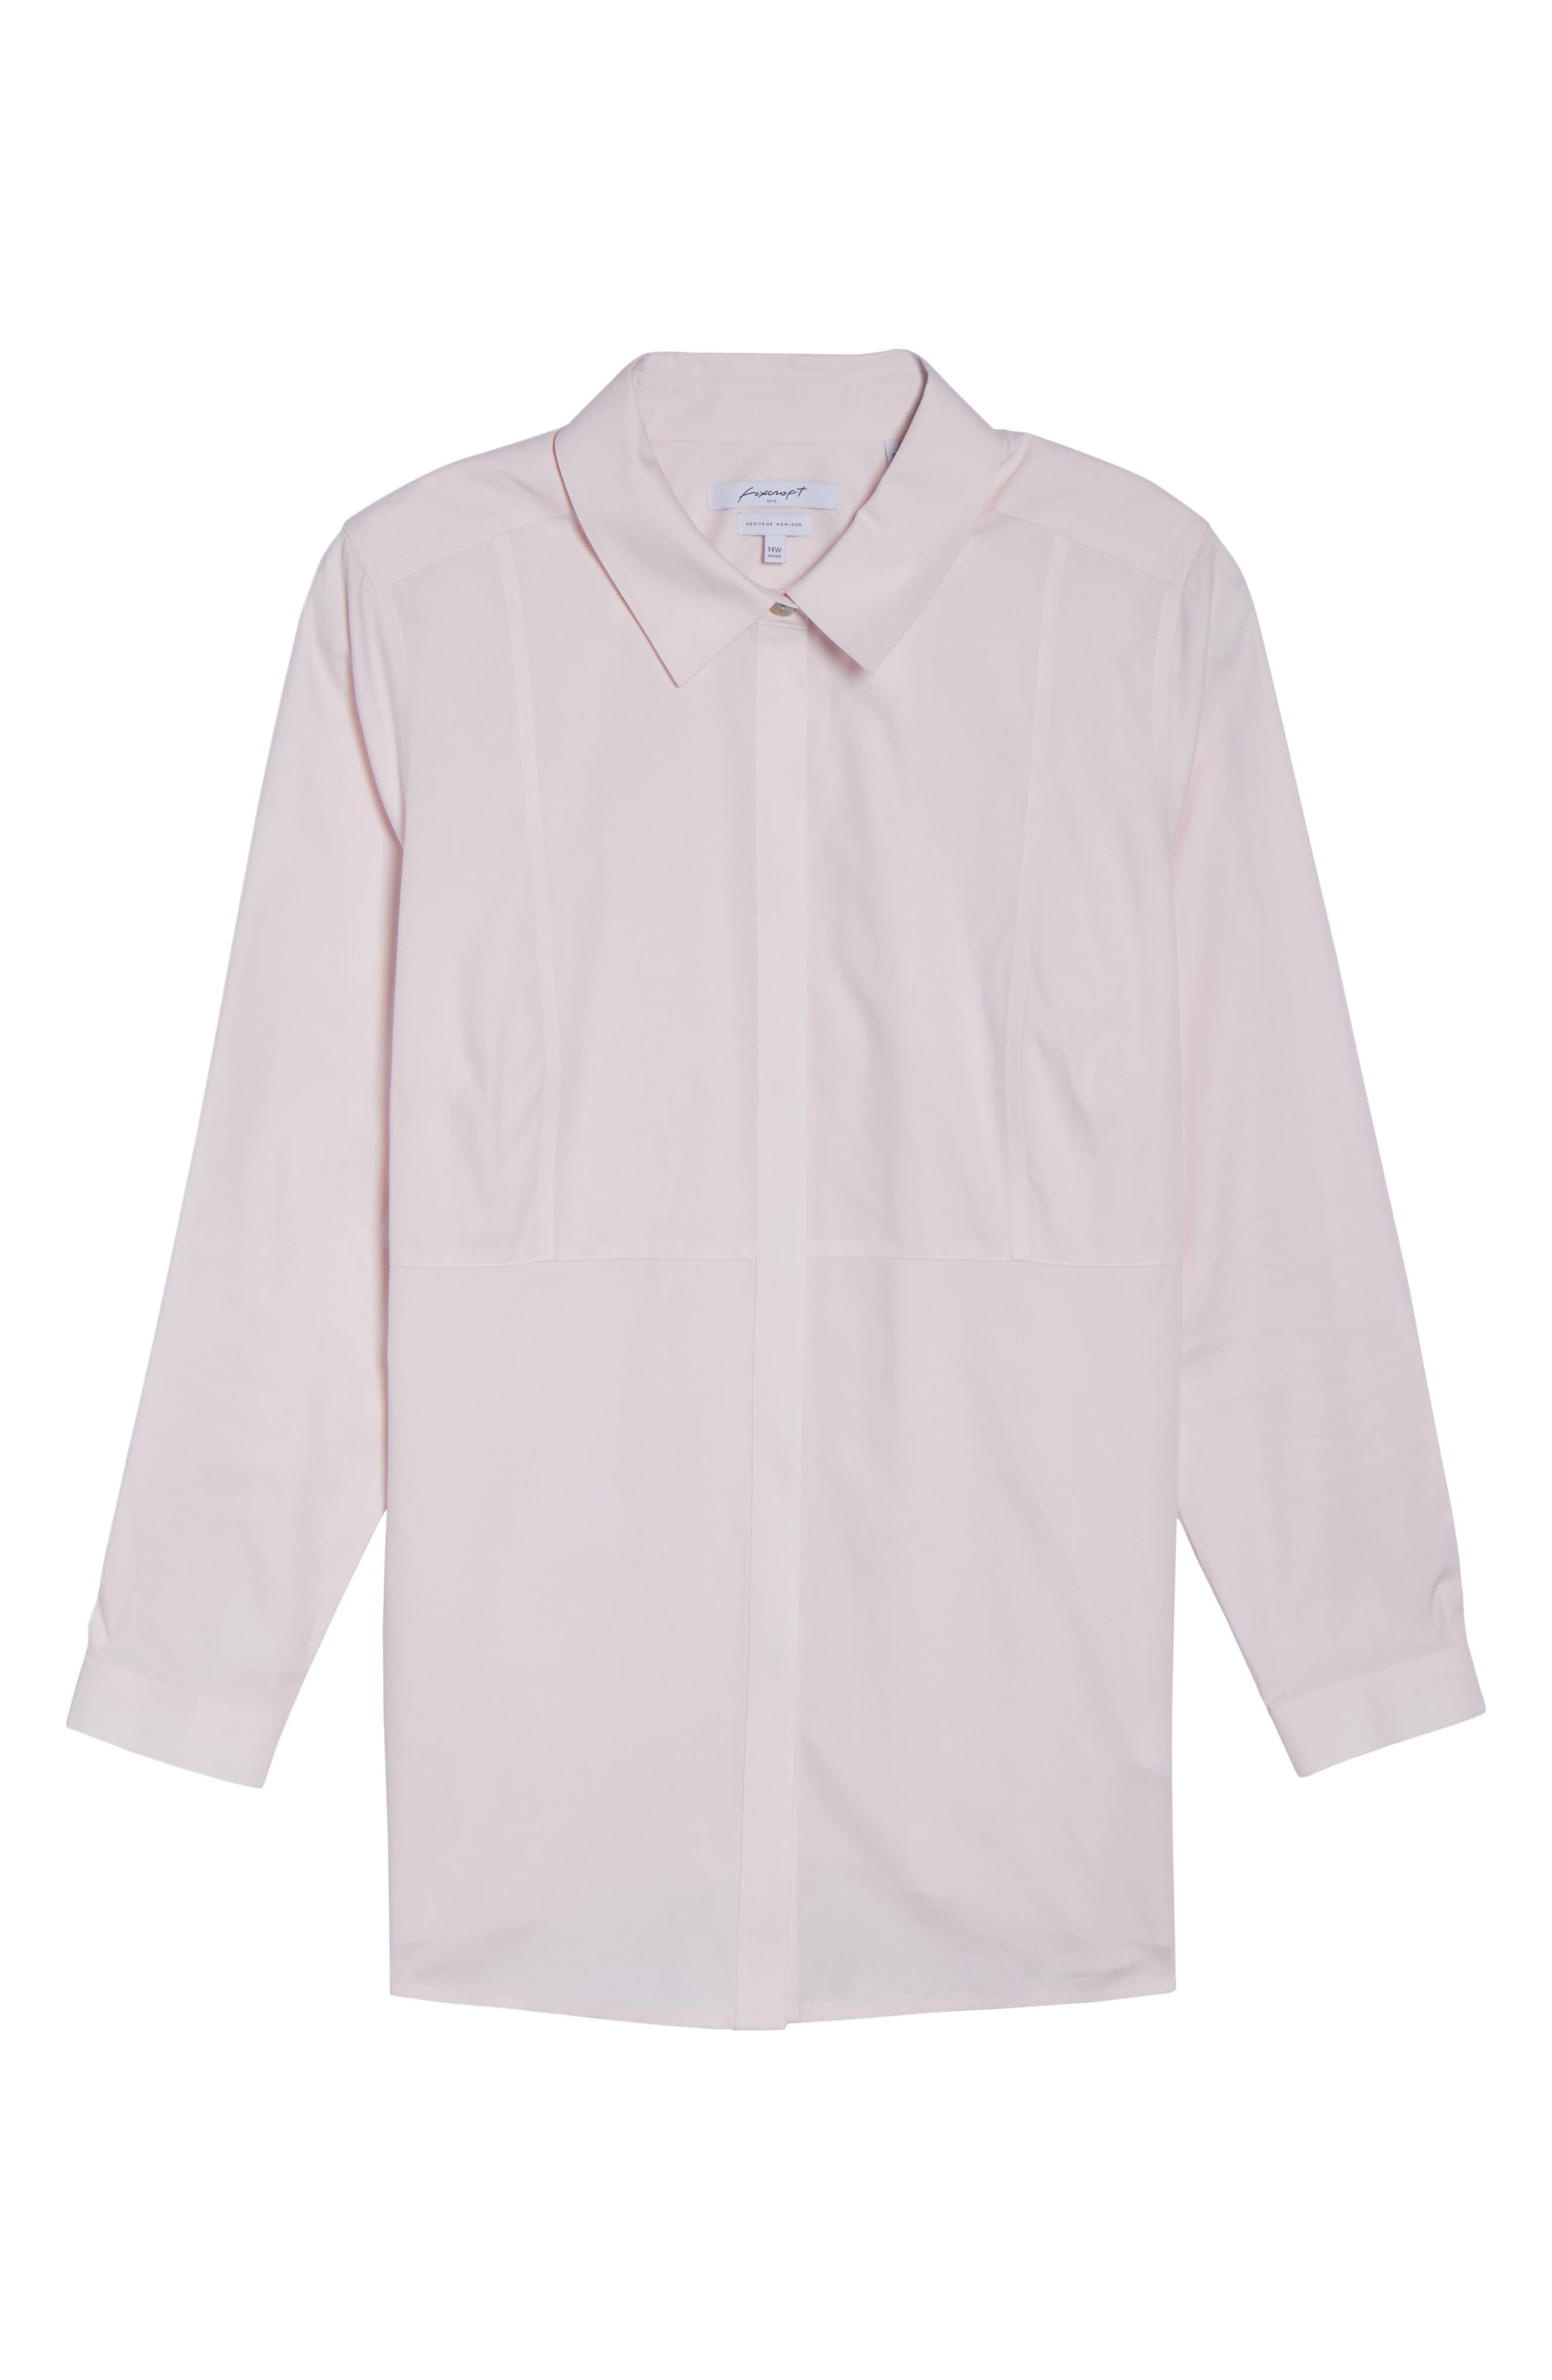 Pinpoint Oxford Cloth Shirt,                             Alternate thumbnail 18, color,